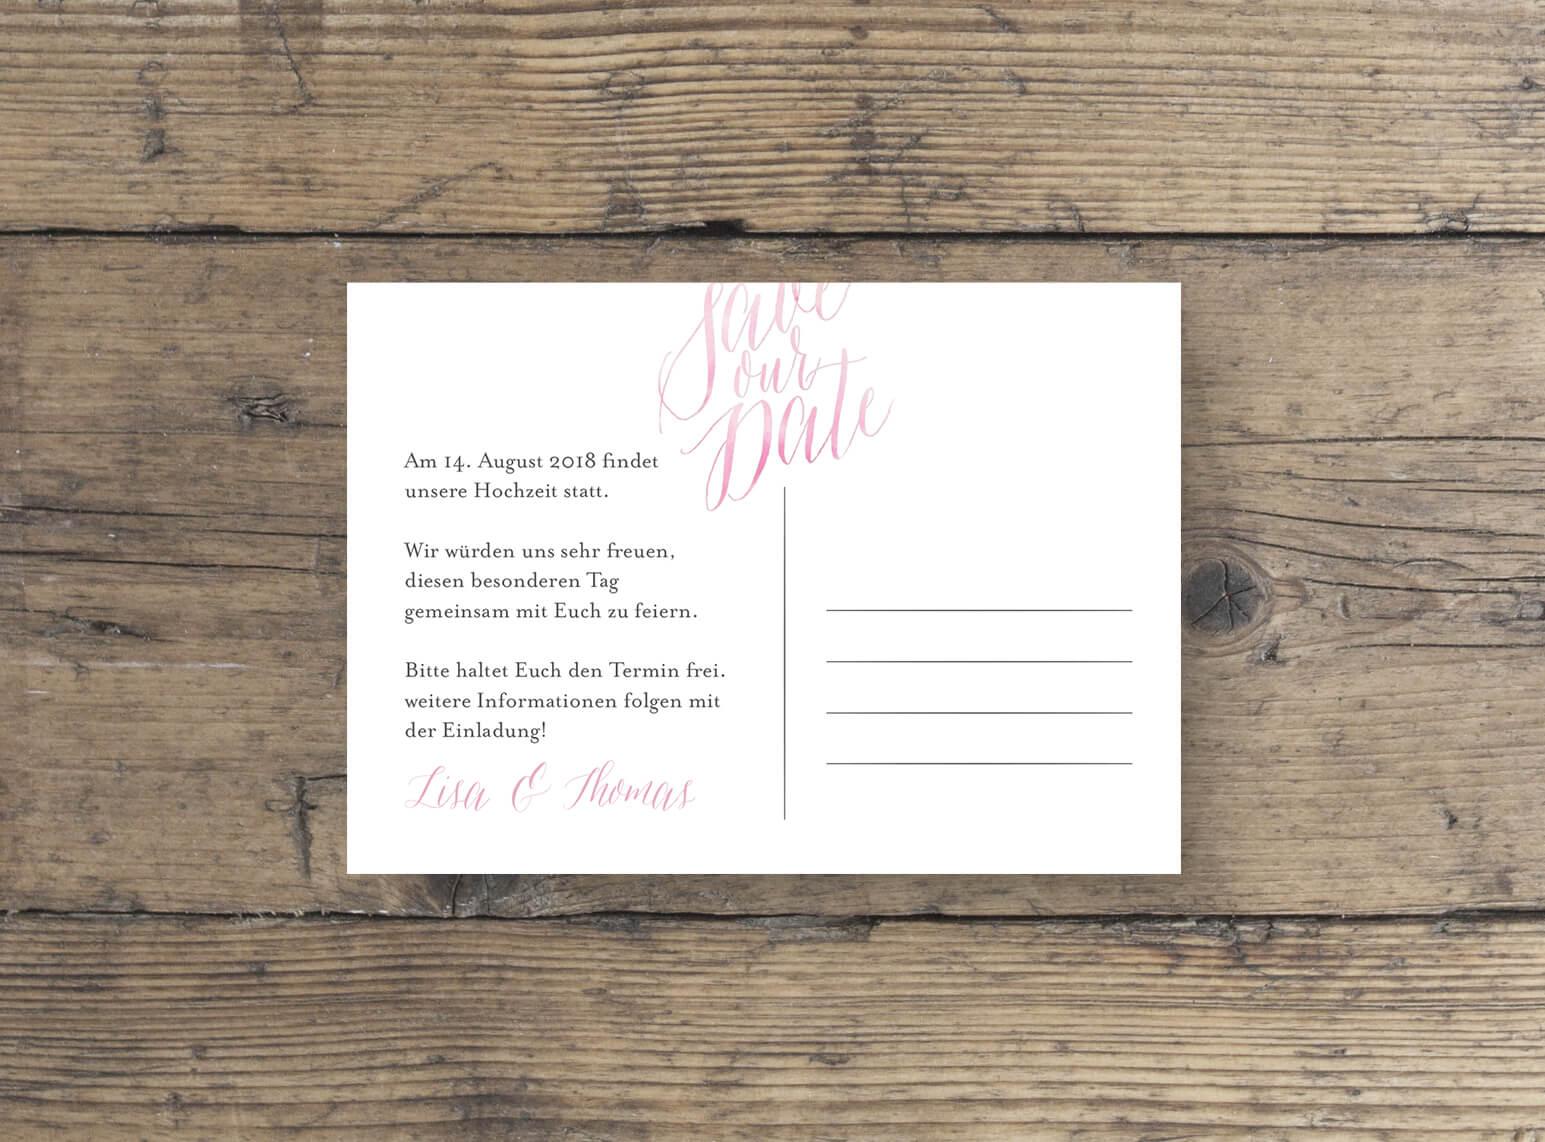 Hochzeitspapeterie, Save the Date Karte, rosa, Aquarell, Kalligrafie, grau, rueckseite